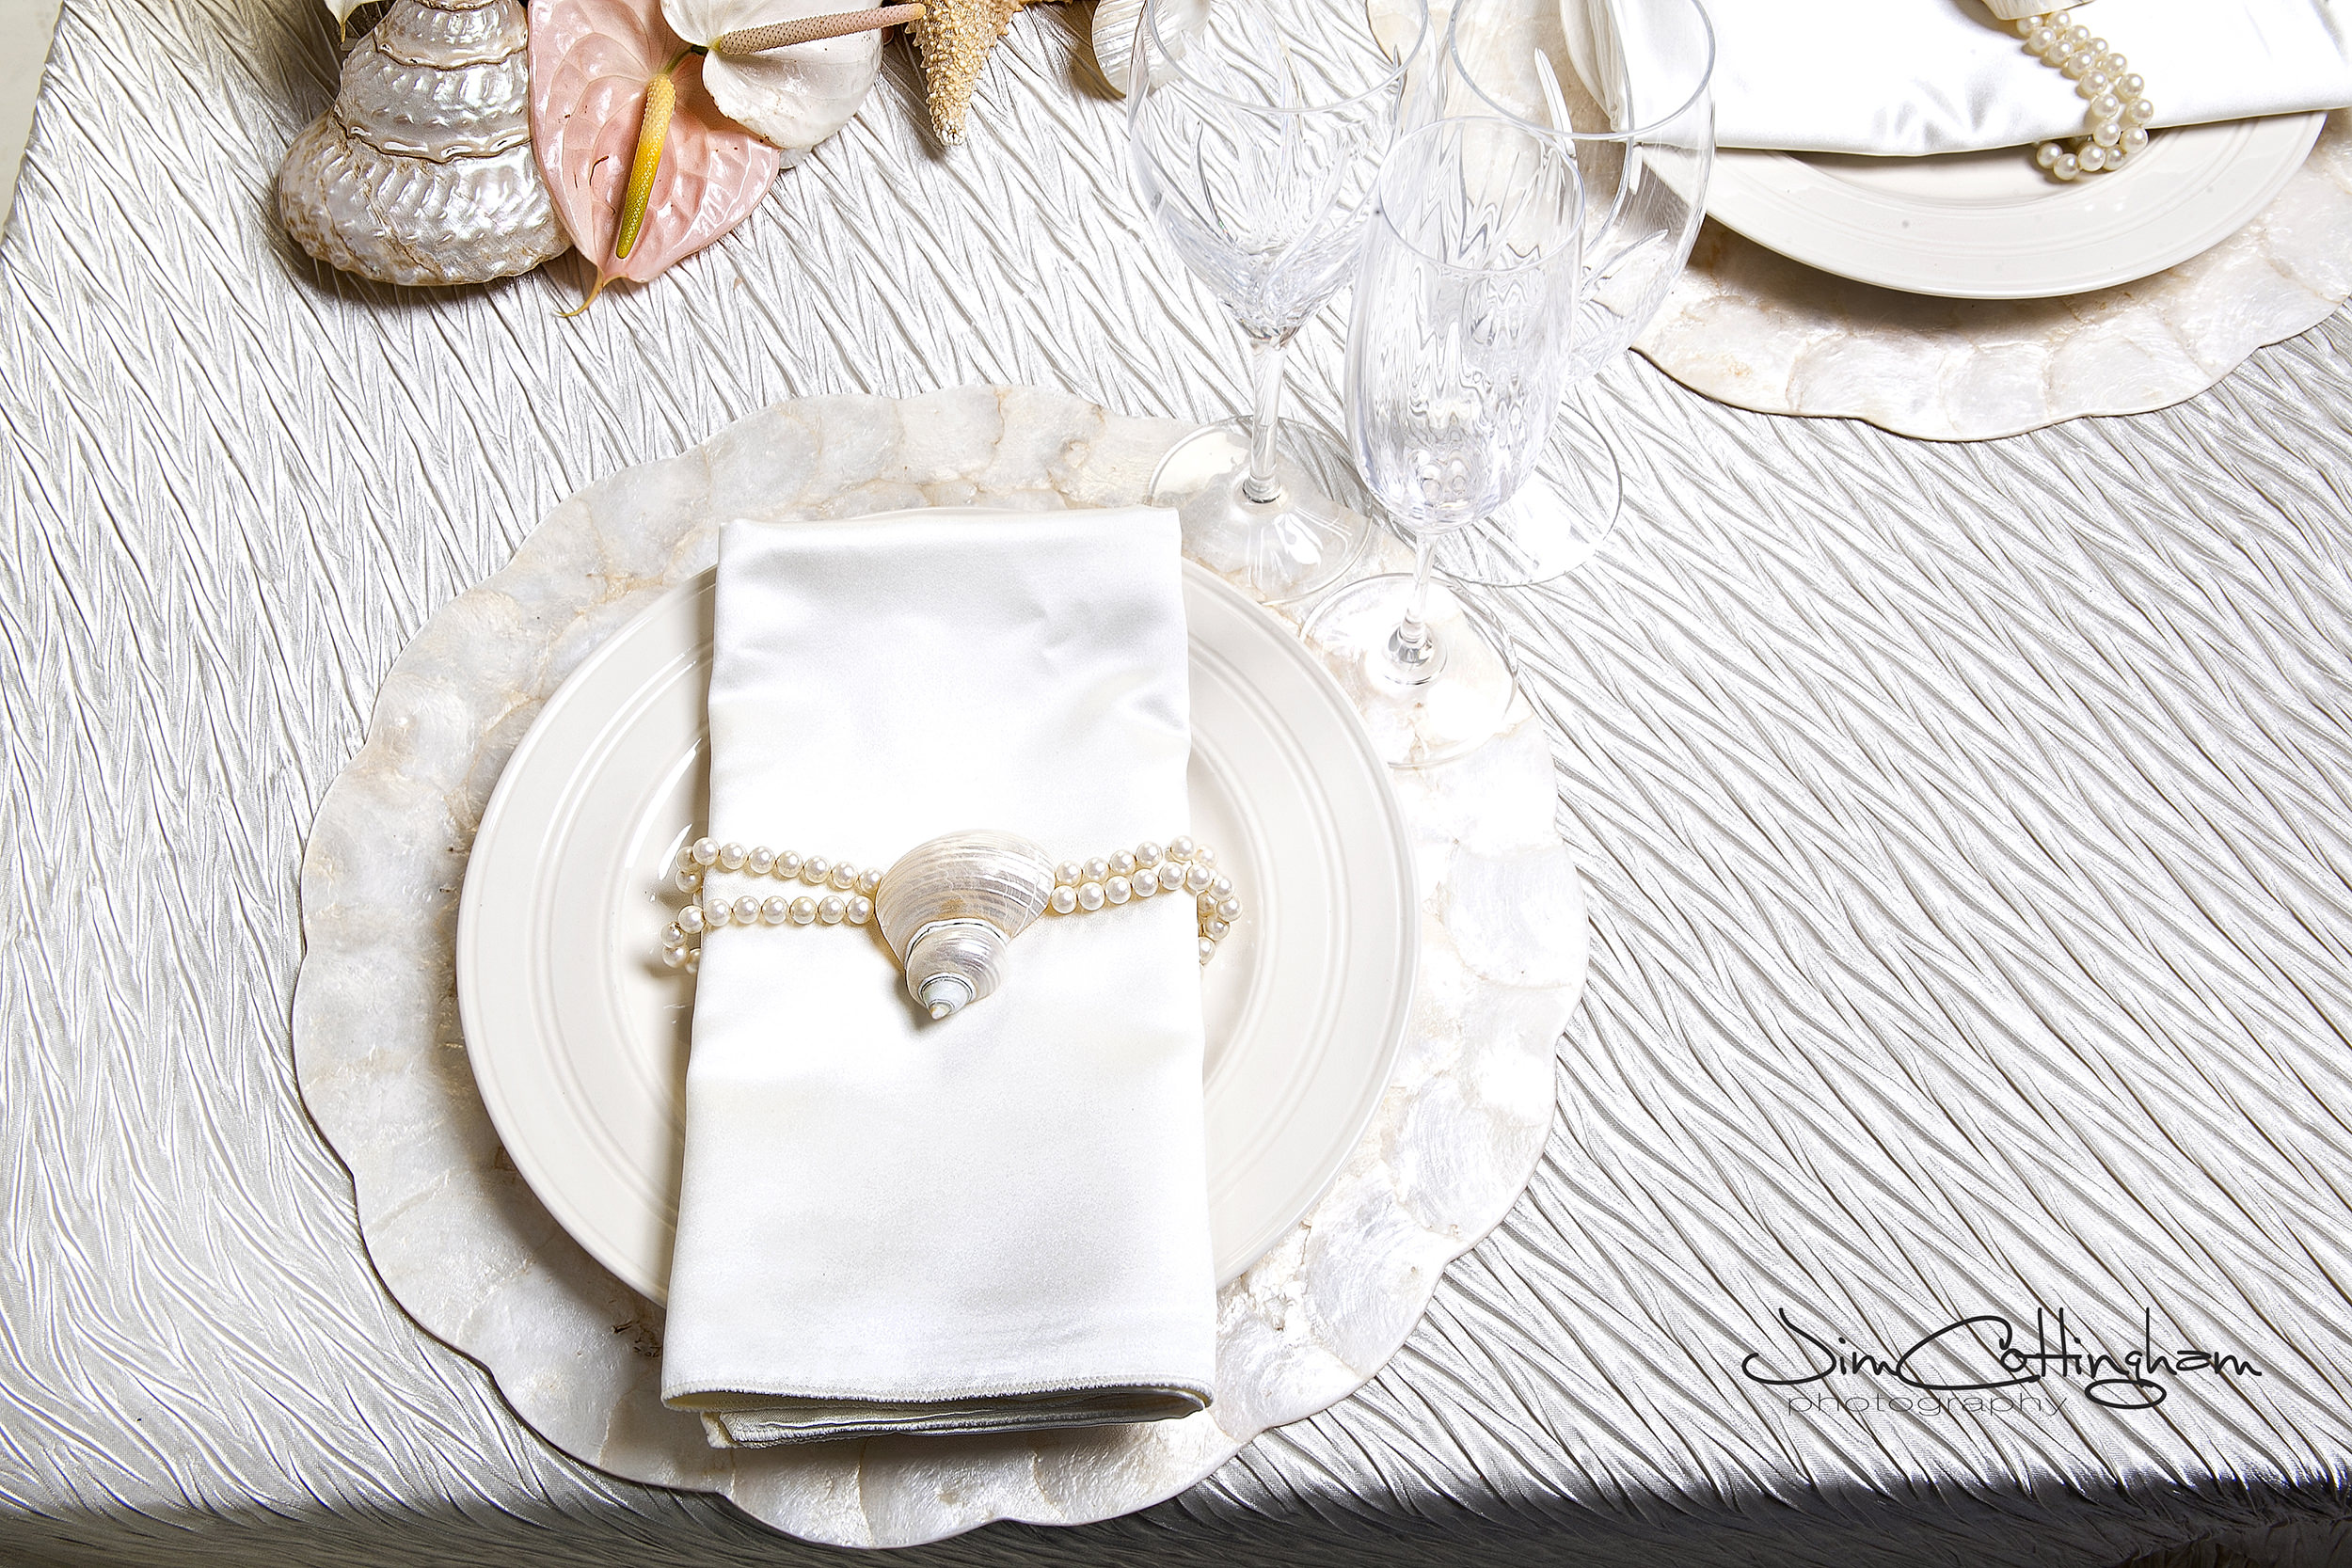 01 Philadelphia Wedding Florist Under the Sea Centerpiece Seashell Anthurium Pearls.jpg